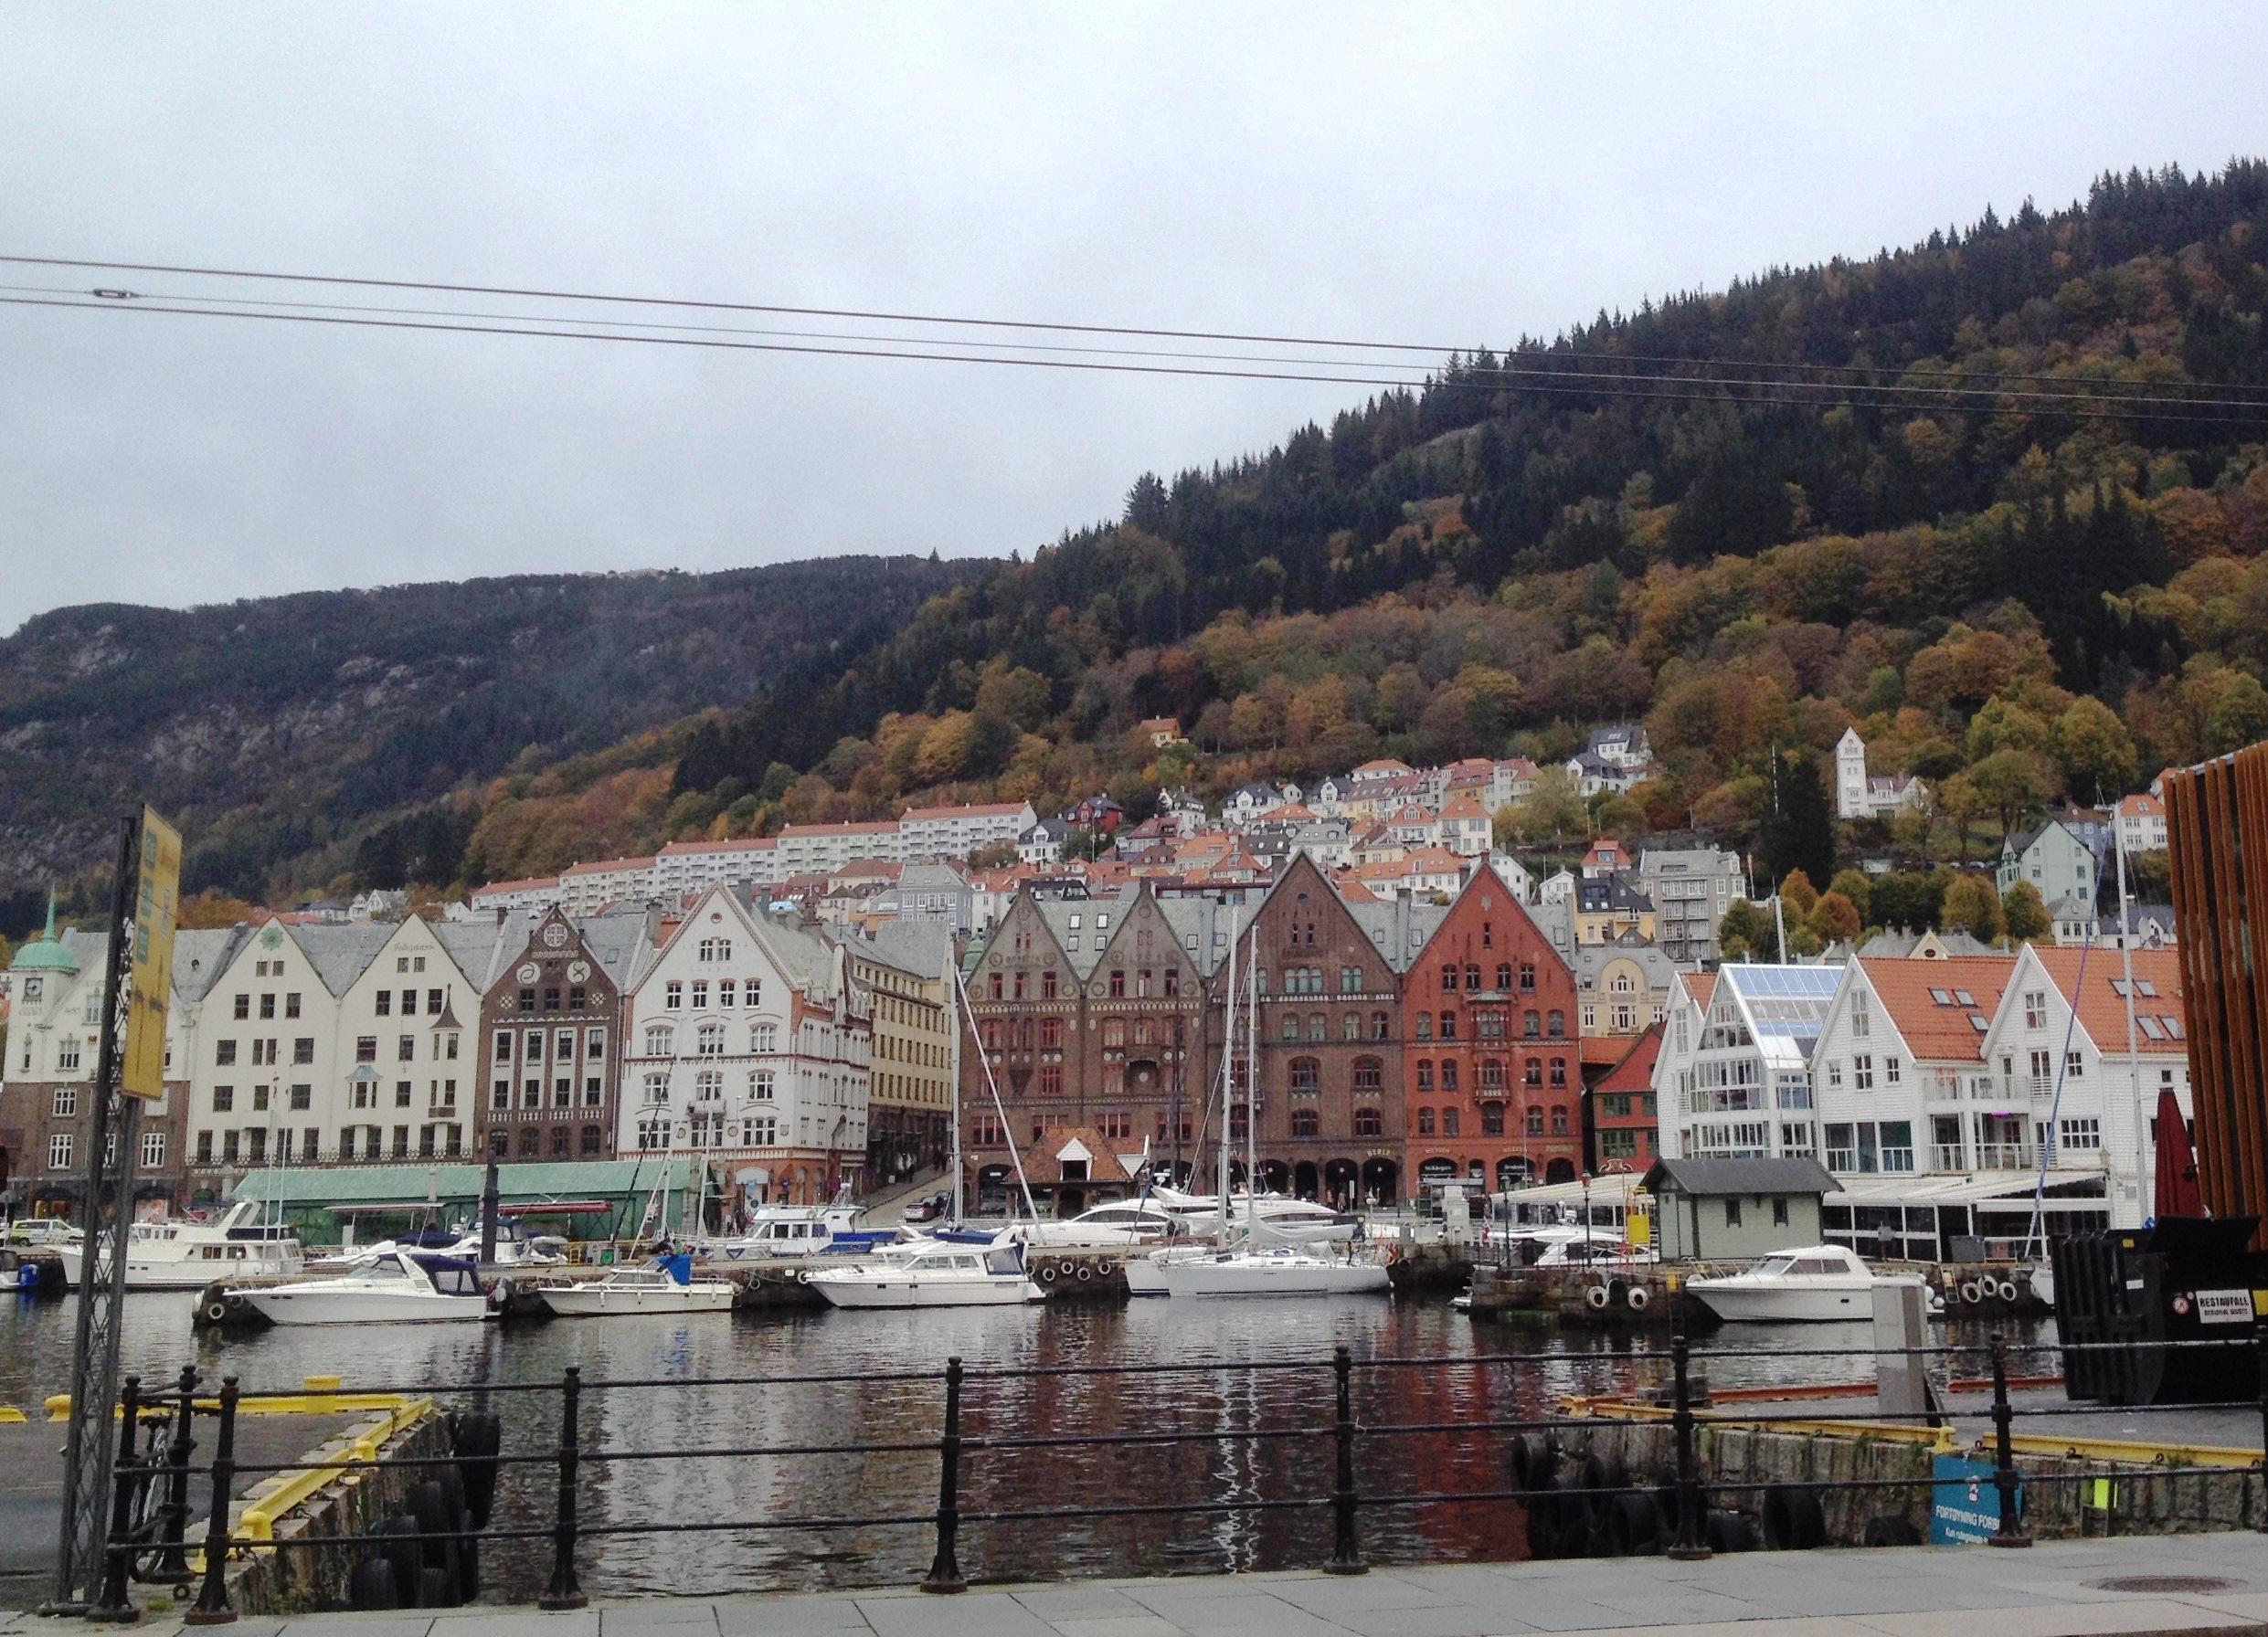 bergen-norge-kust-travelgrip- (2)